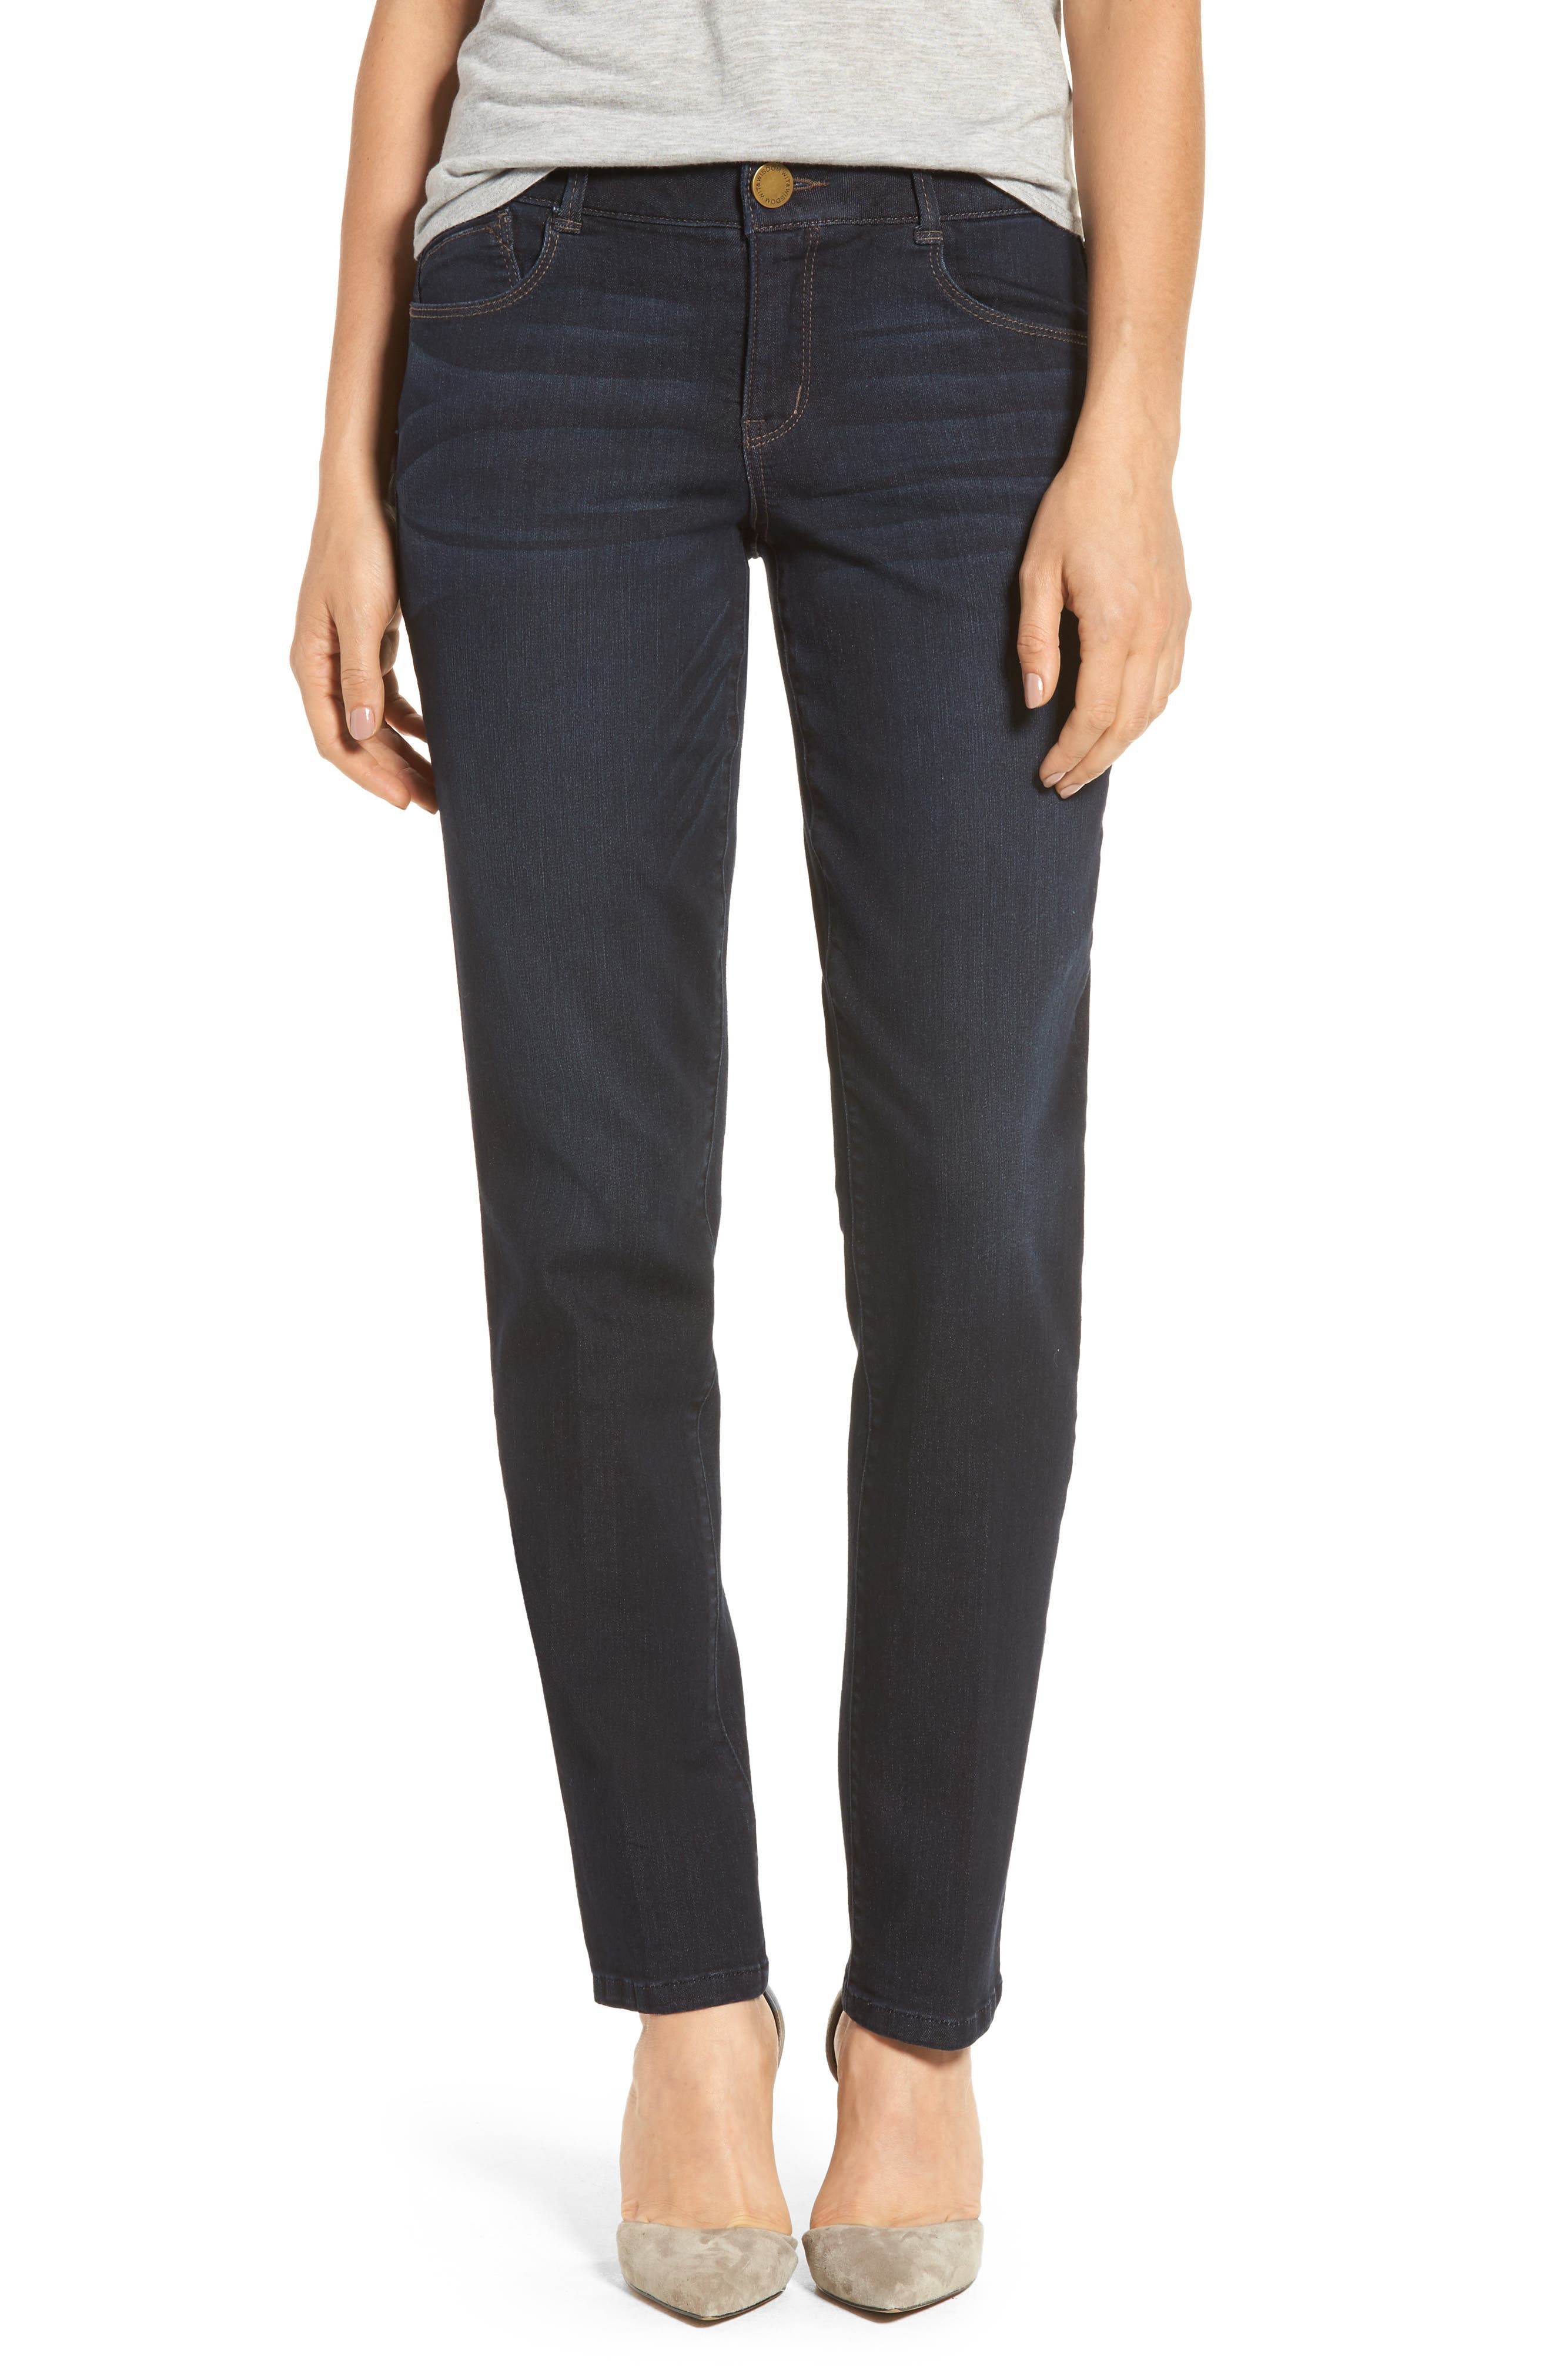 Main Image - Wit & Wisdom Ab-solution Straight Leg Jeans (Regular & Petite) (Nordstrom Exclusive)